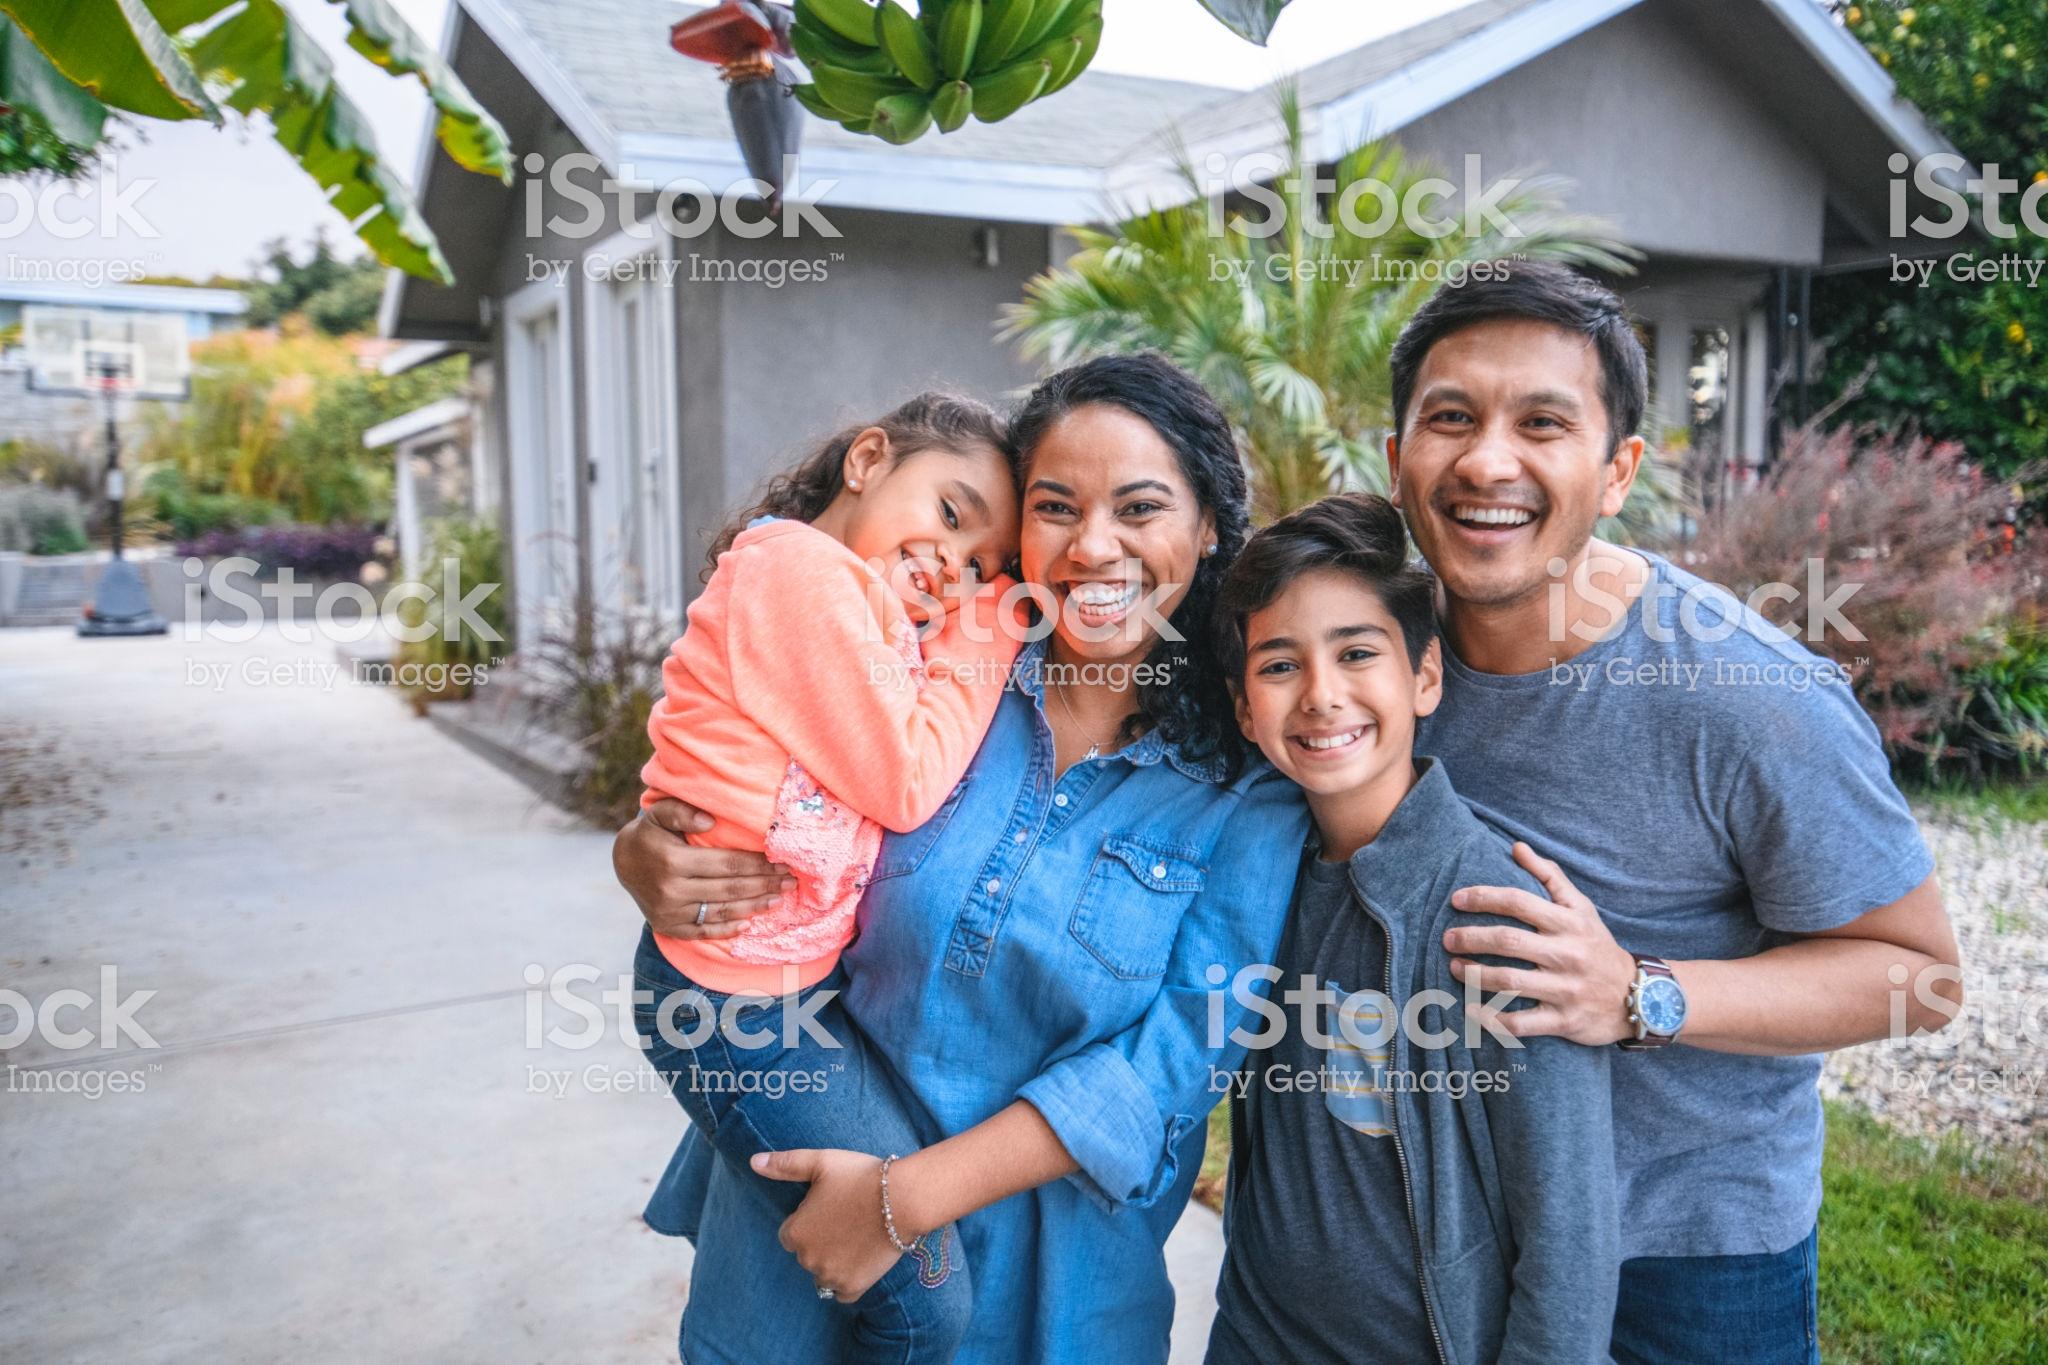 family smiling